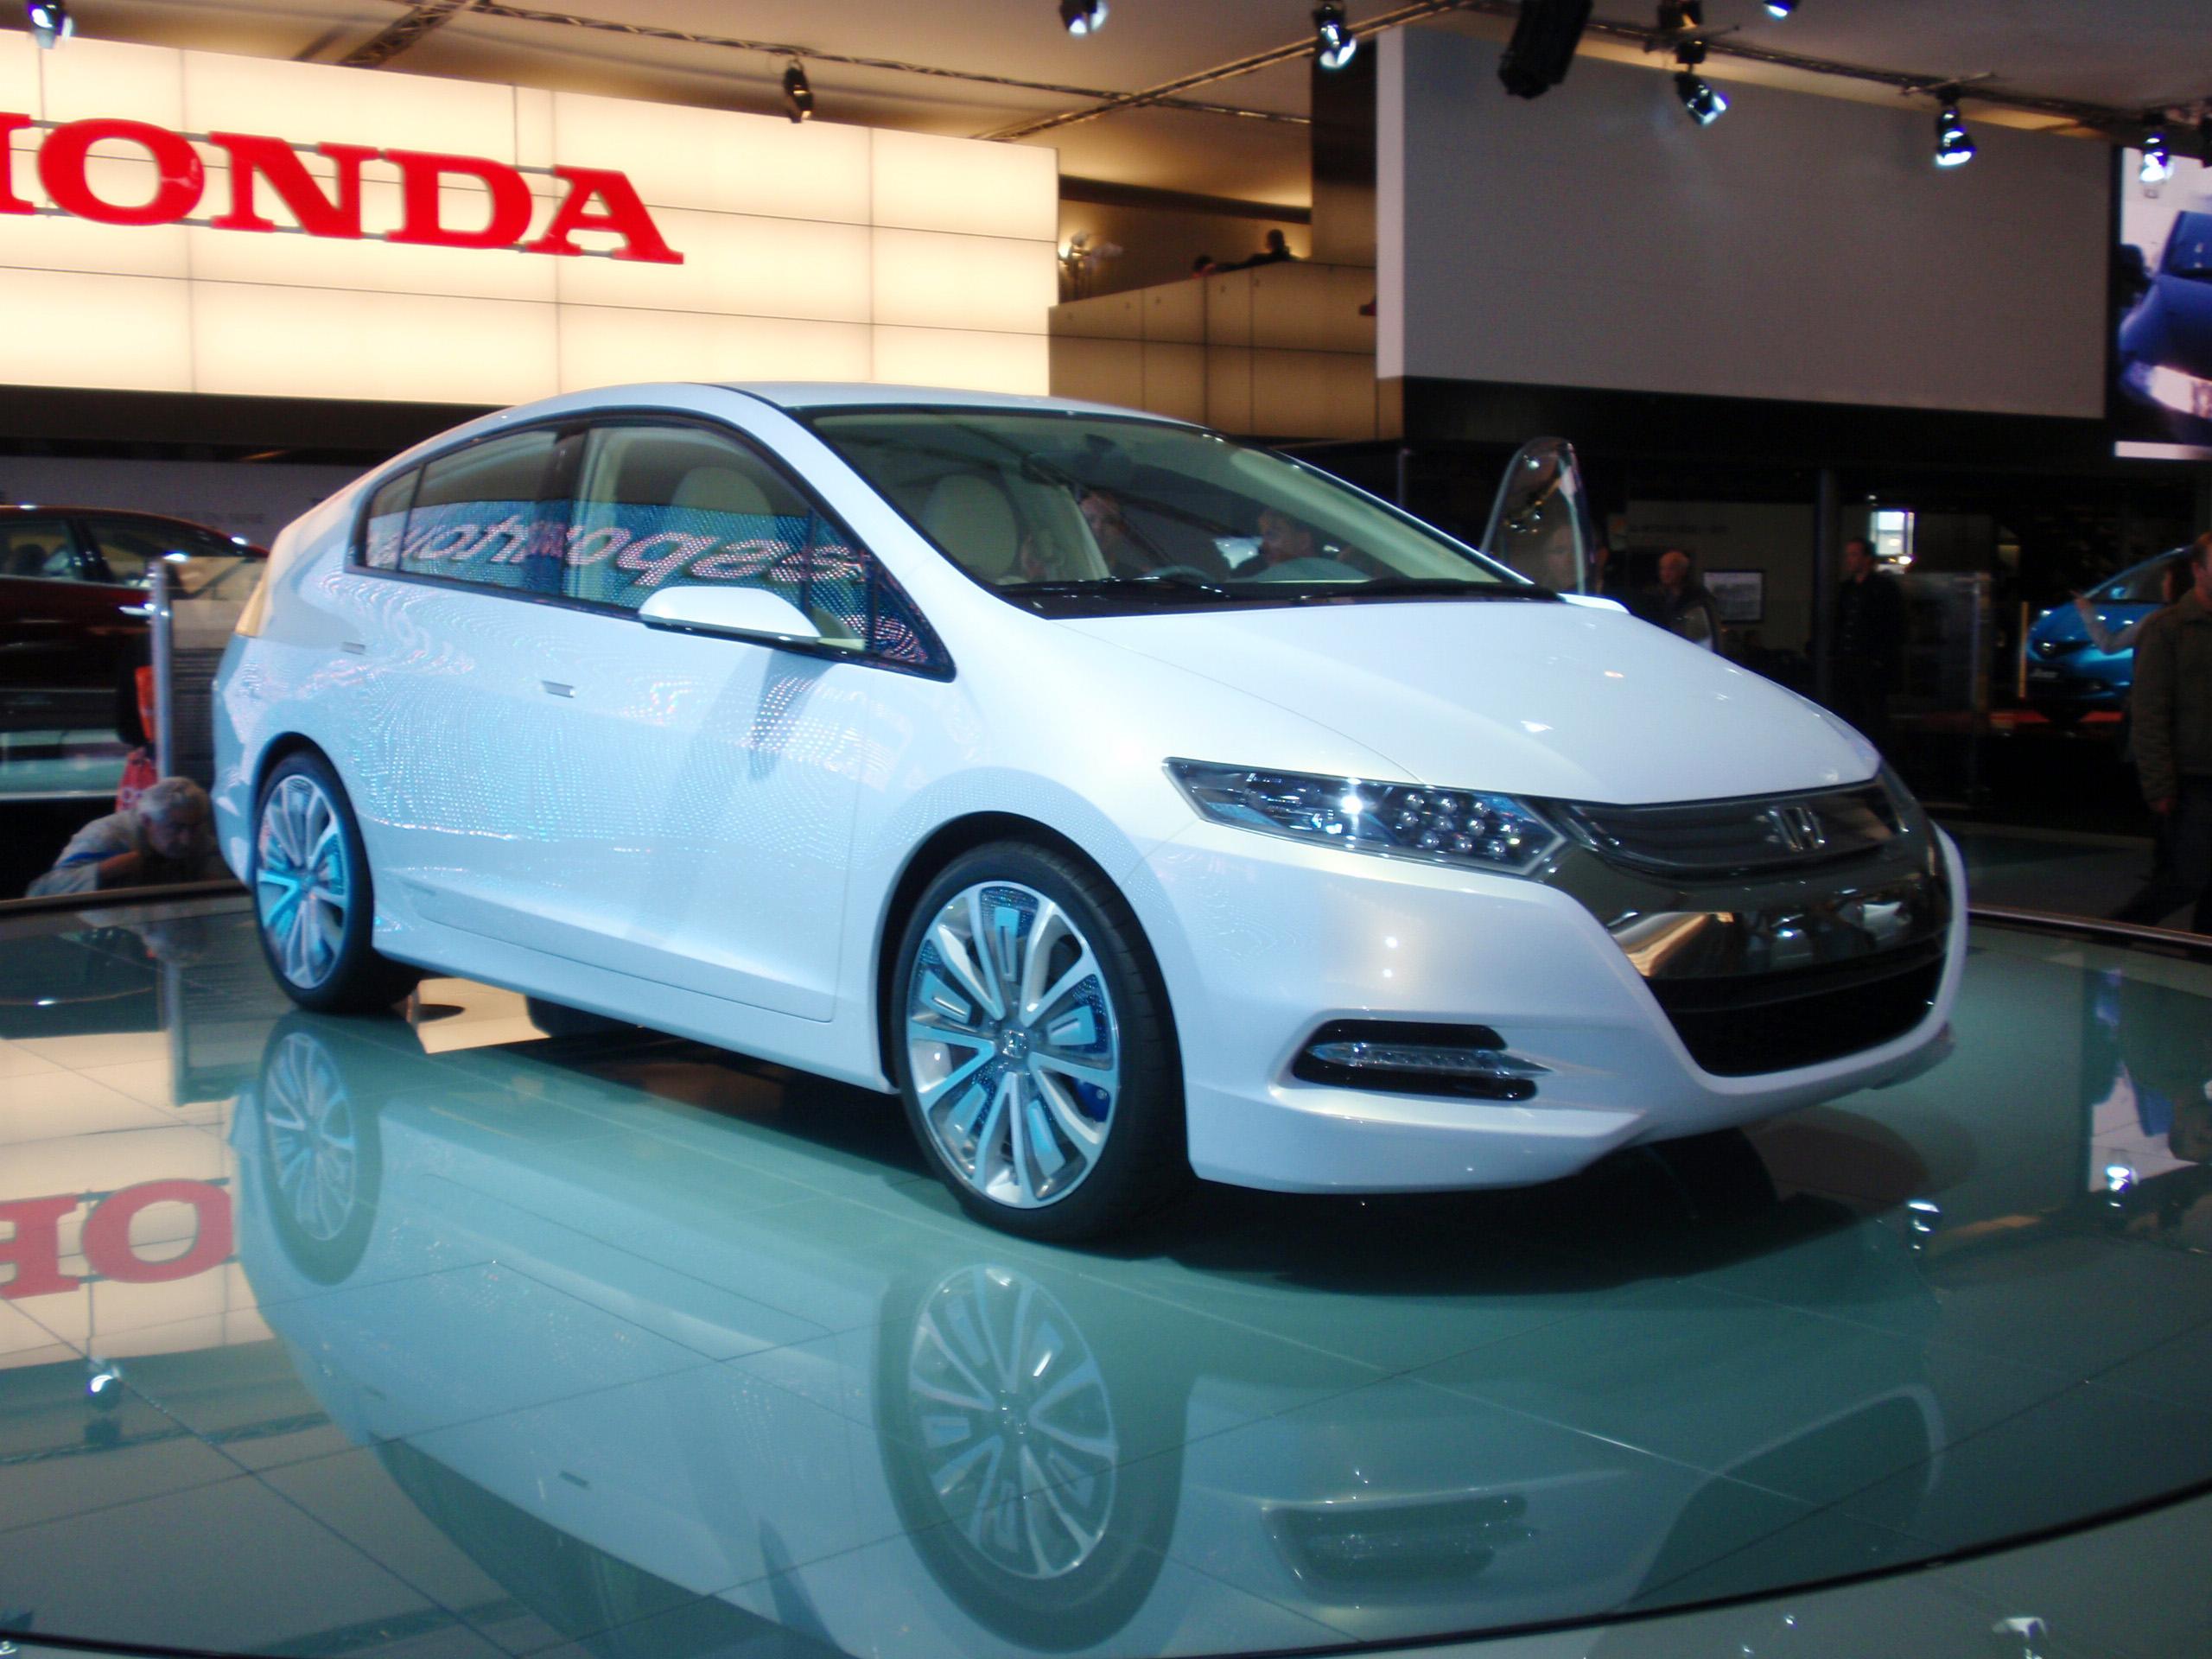 File:Honda Insight 2008 008.JPG - Wikipedia